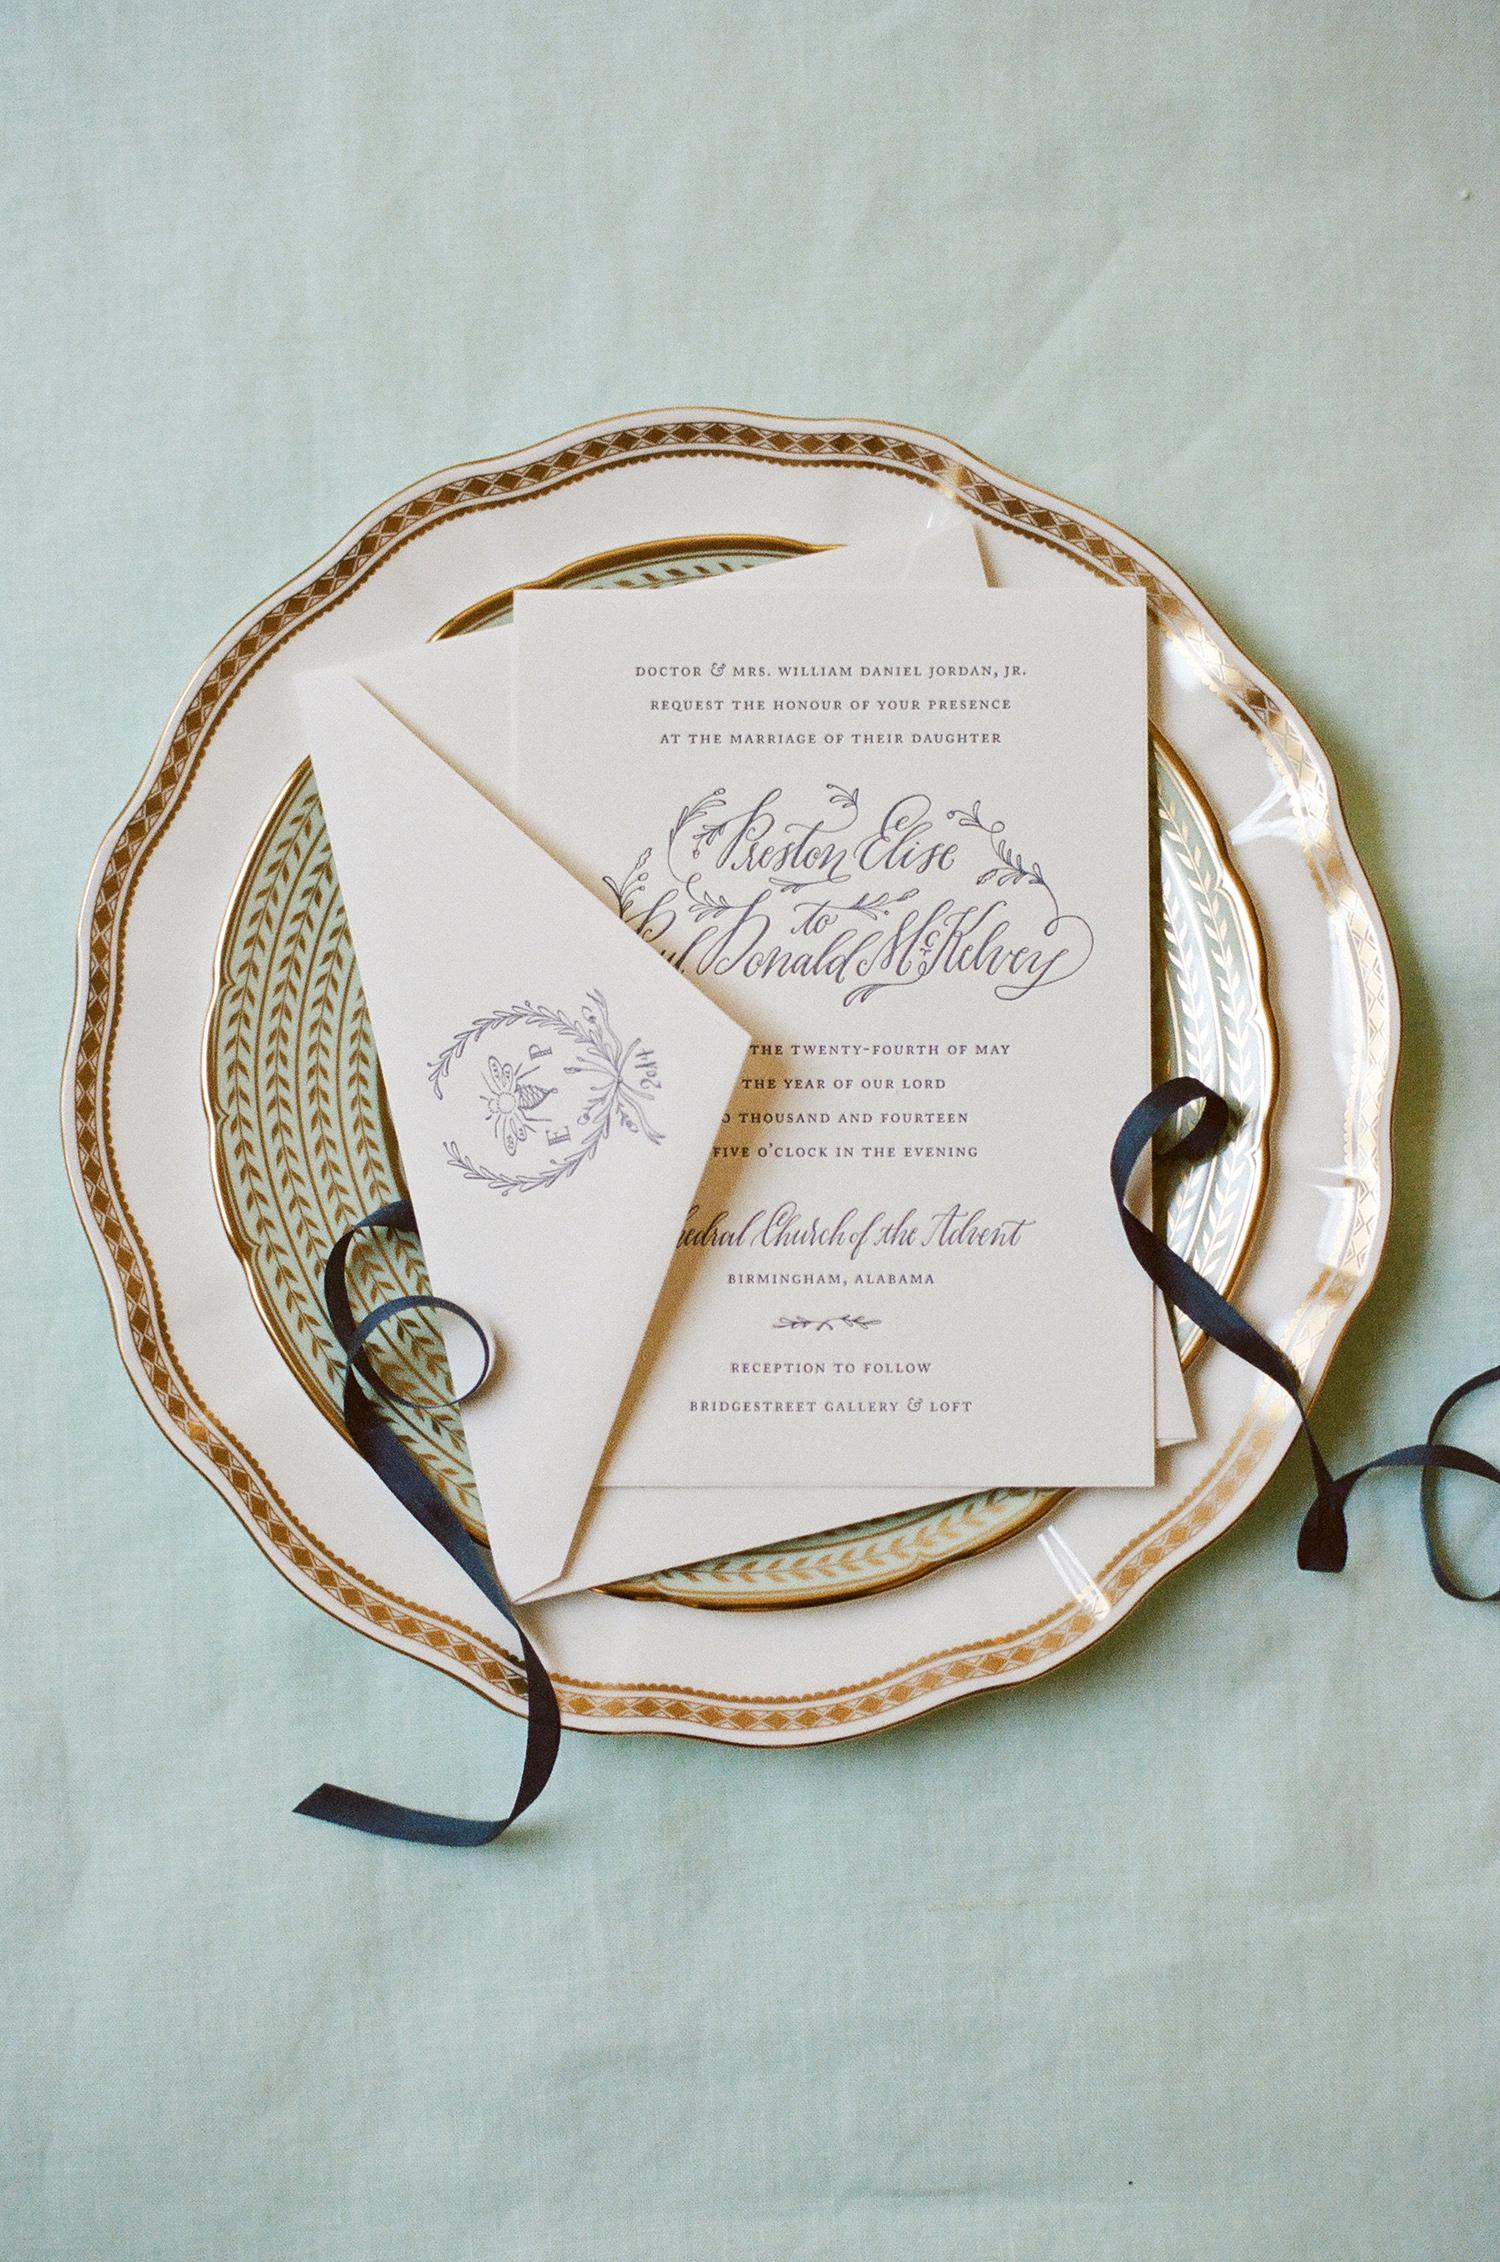 bee wedding ideas invitation on decorative plate